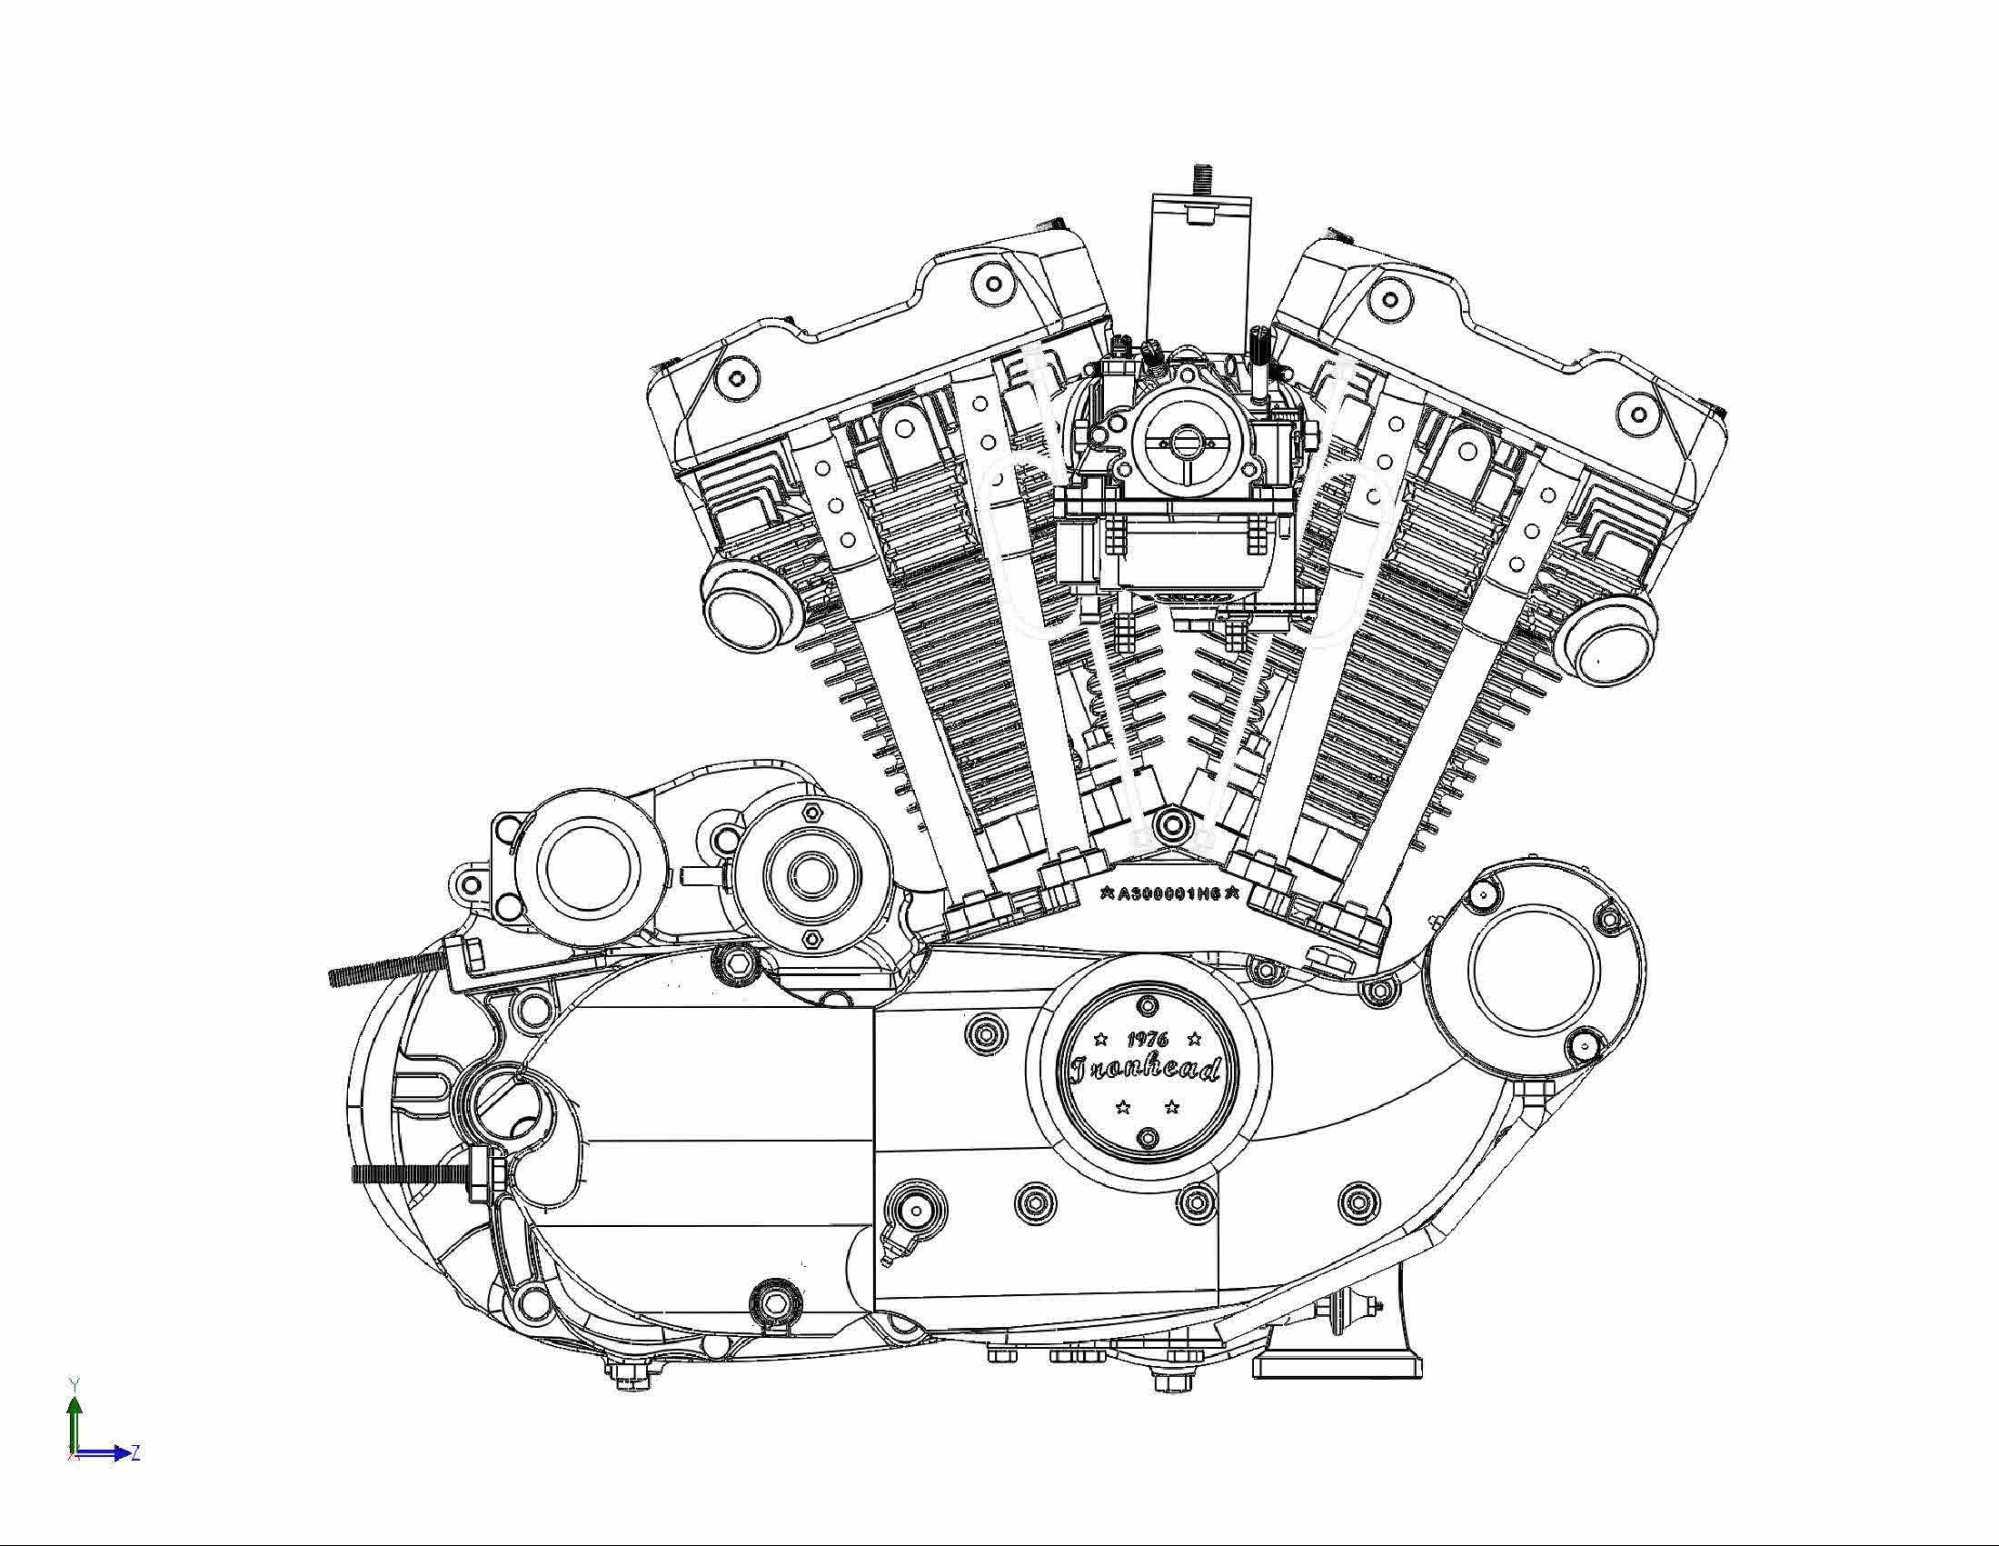 hight resolution of diagram motorcycle engine art wiring diagrams show harley motorcycle motors diagrams